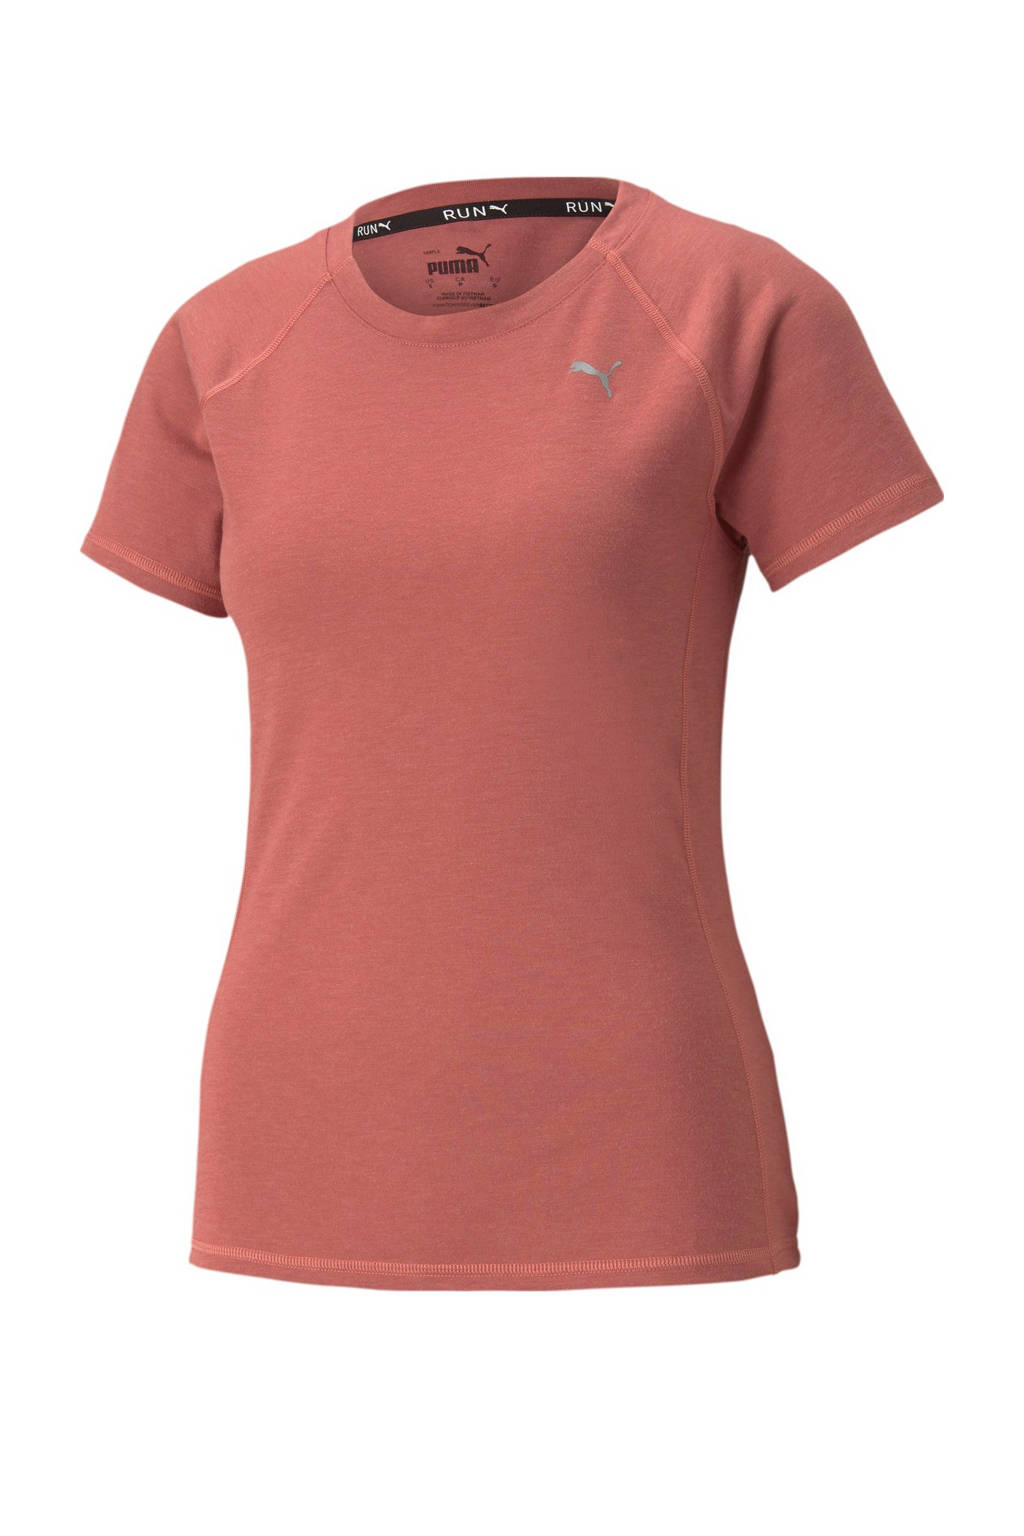 Puma hardloop T-shirt oudroze, Oudroze